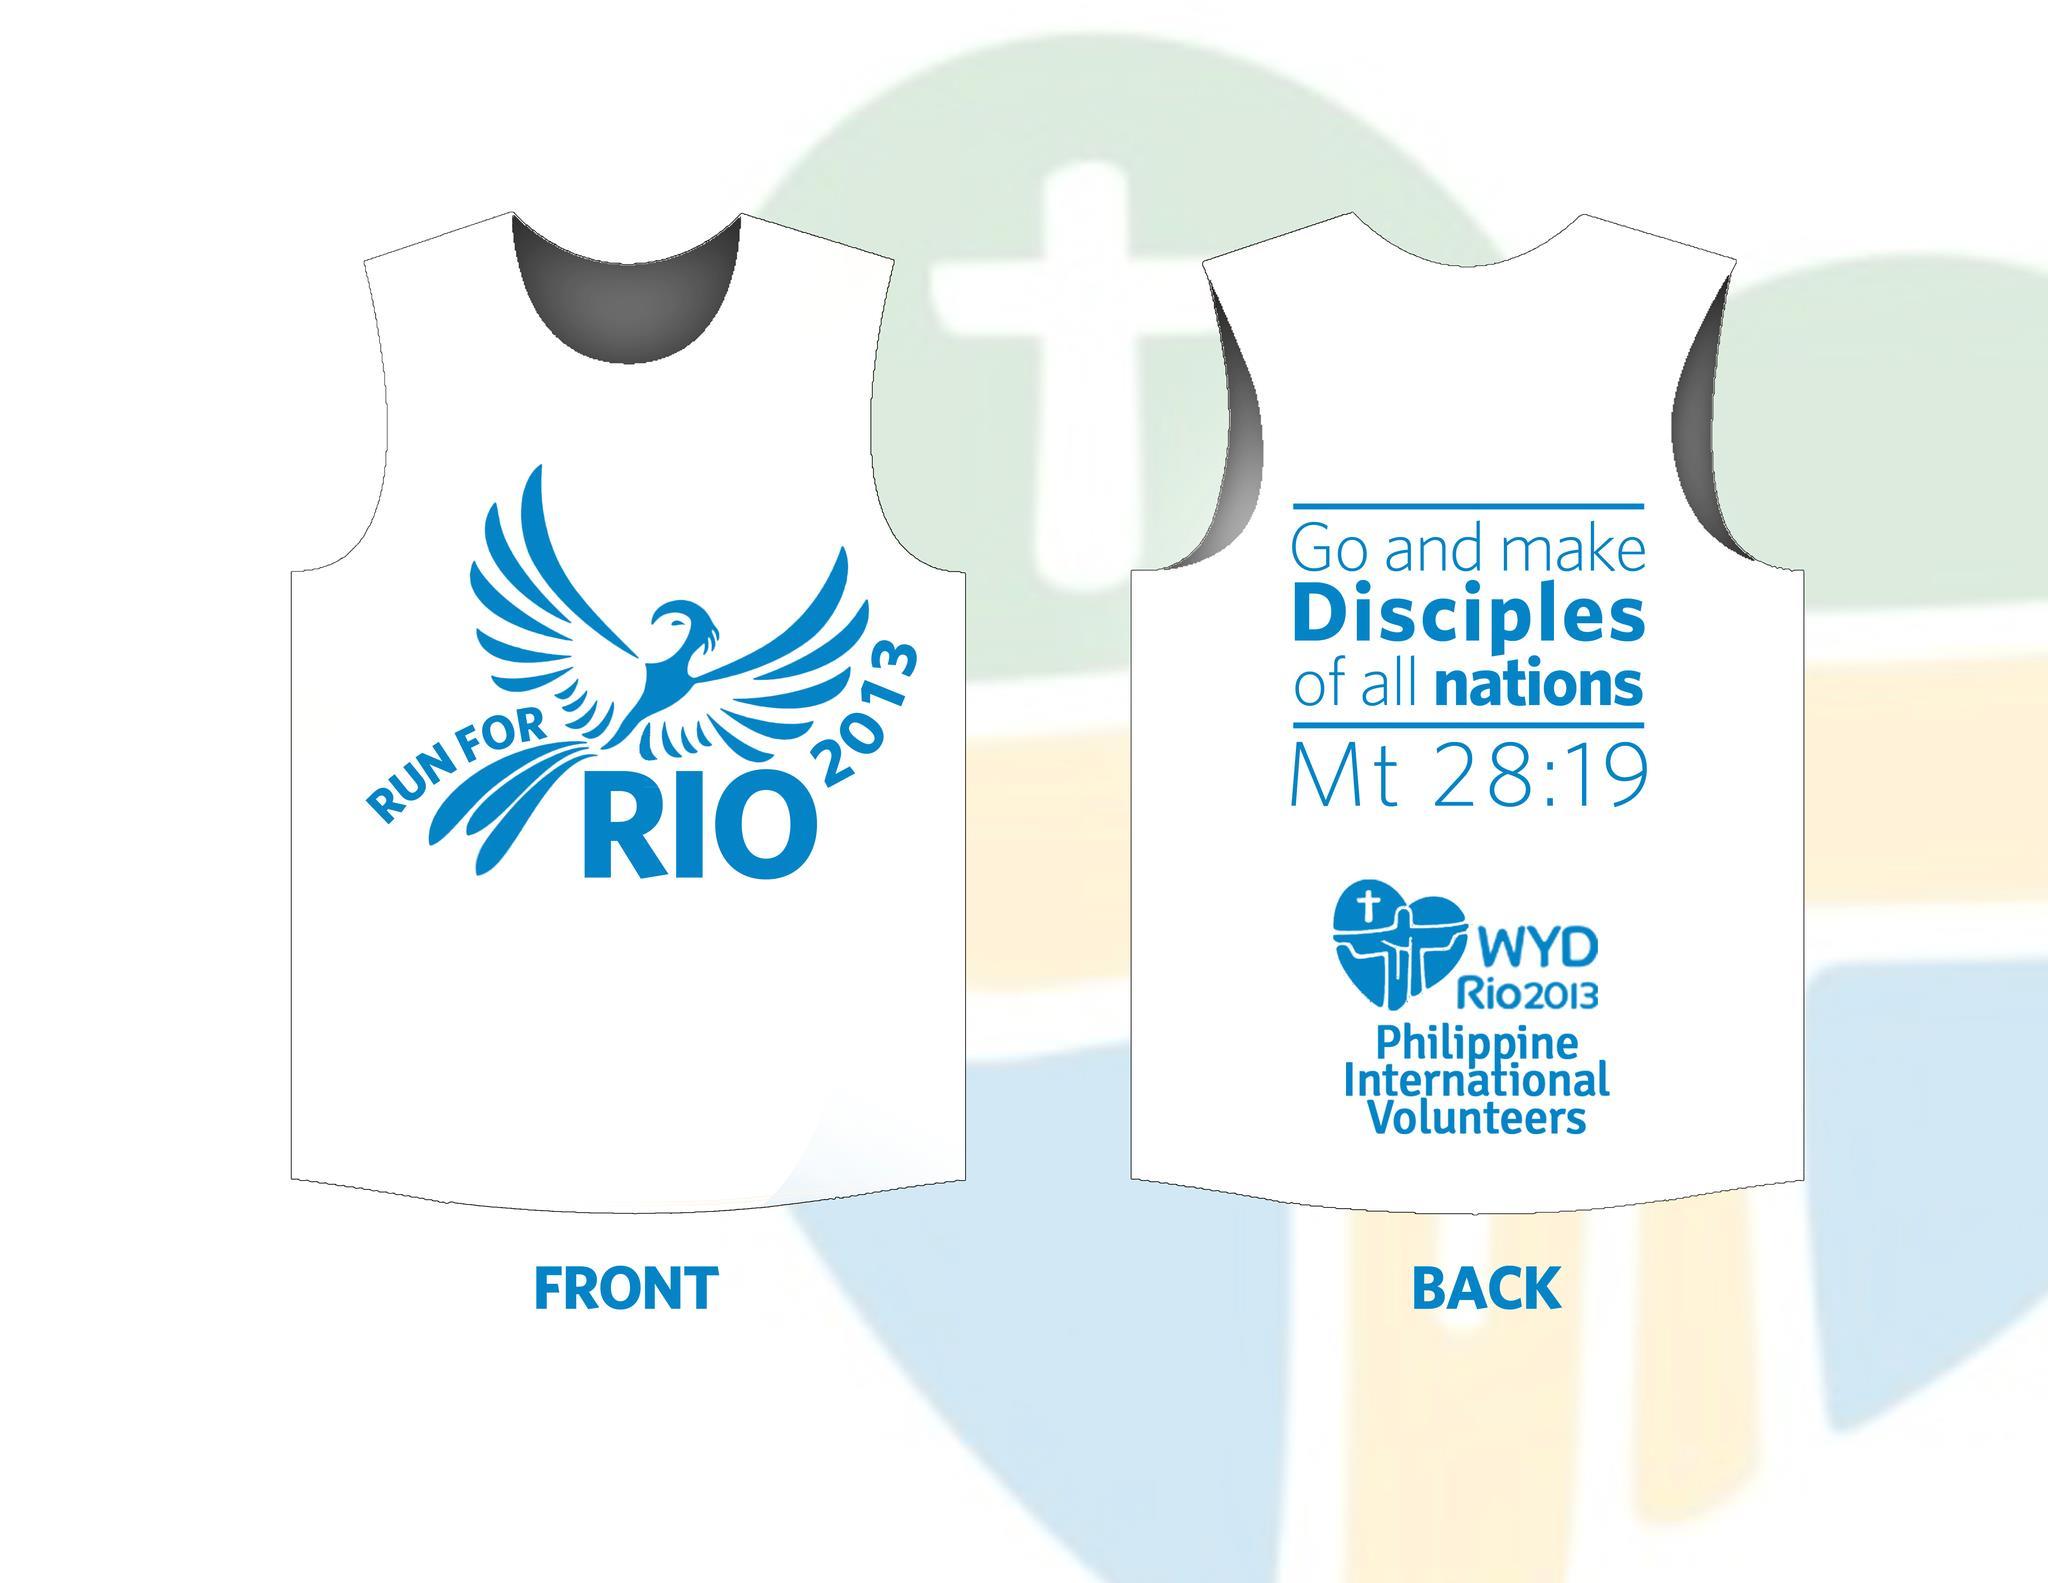 run-for-rio-2013-pampanga-singlet-design-white